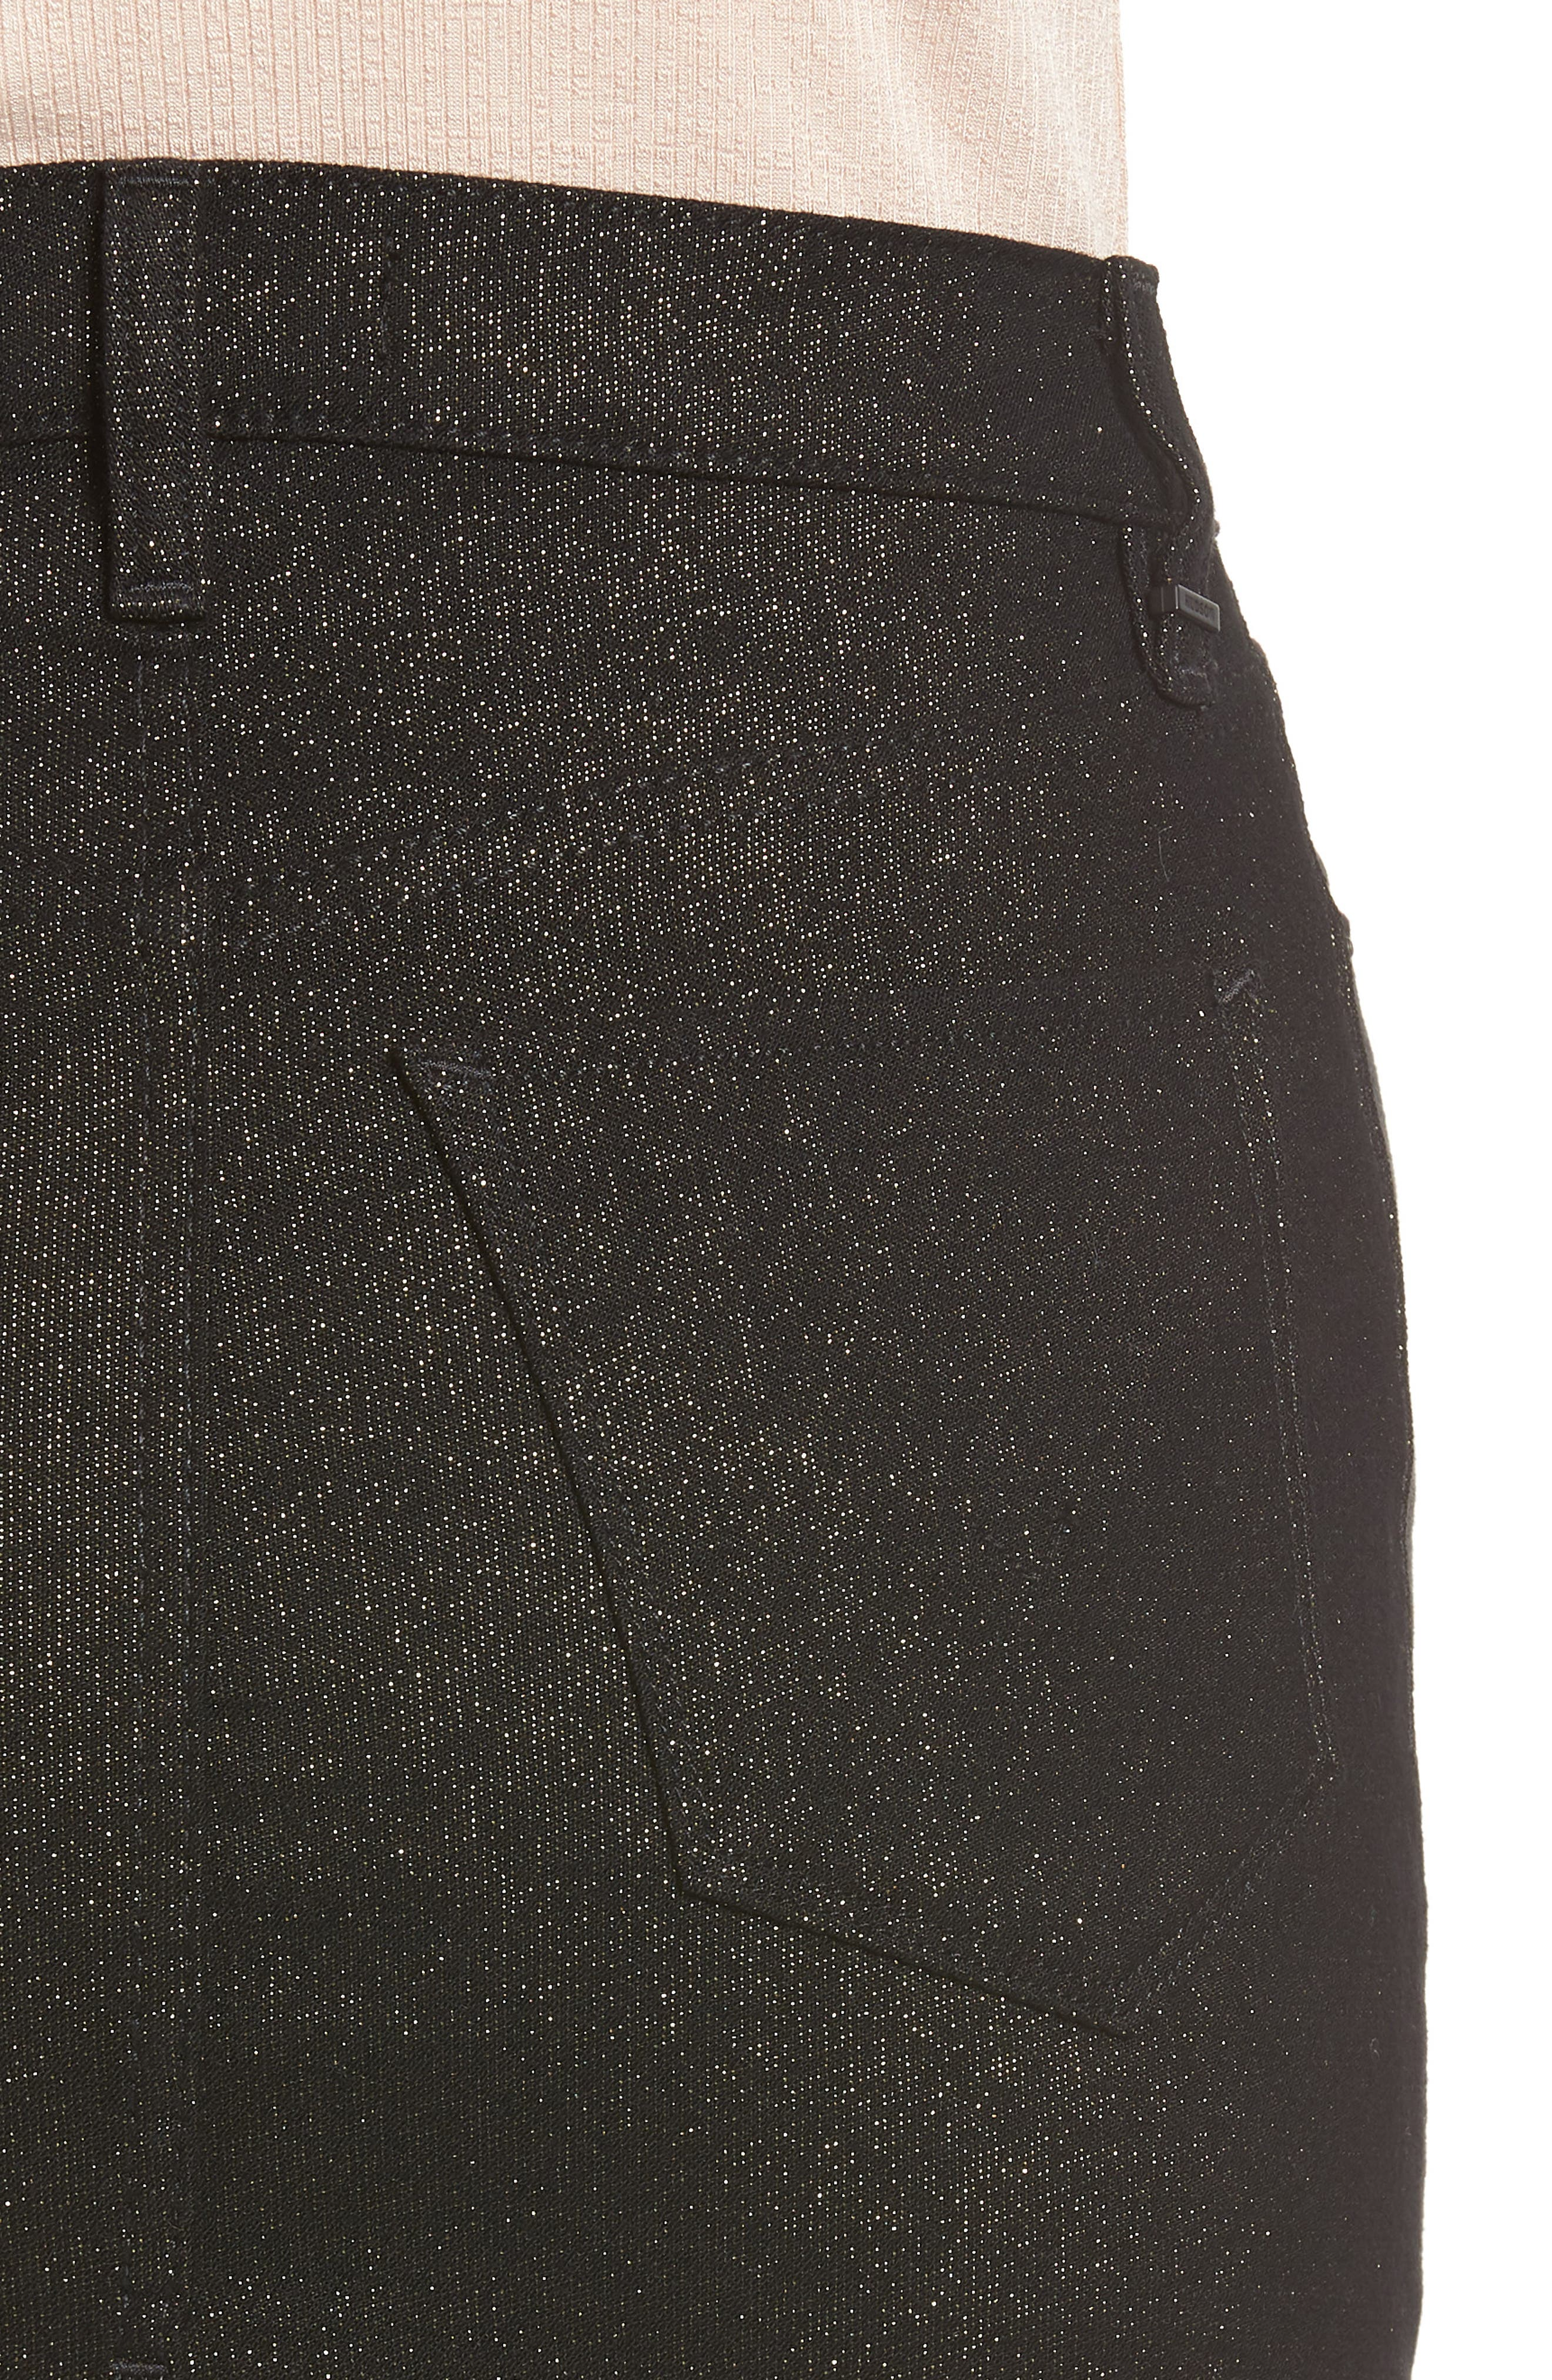 Lulu Sparkle Miniskirt,                             Alternate thumbnail 4, color,                             GOLD STELLAR